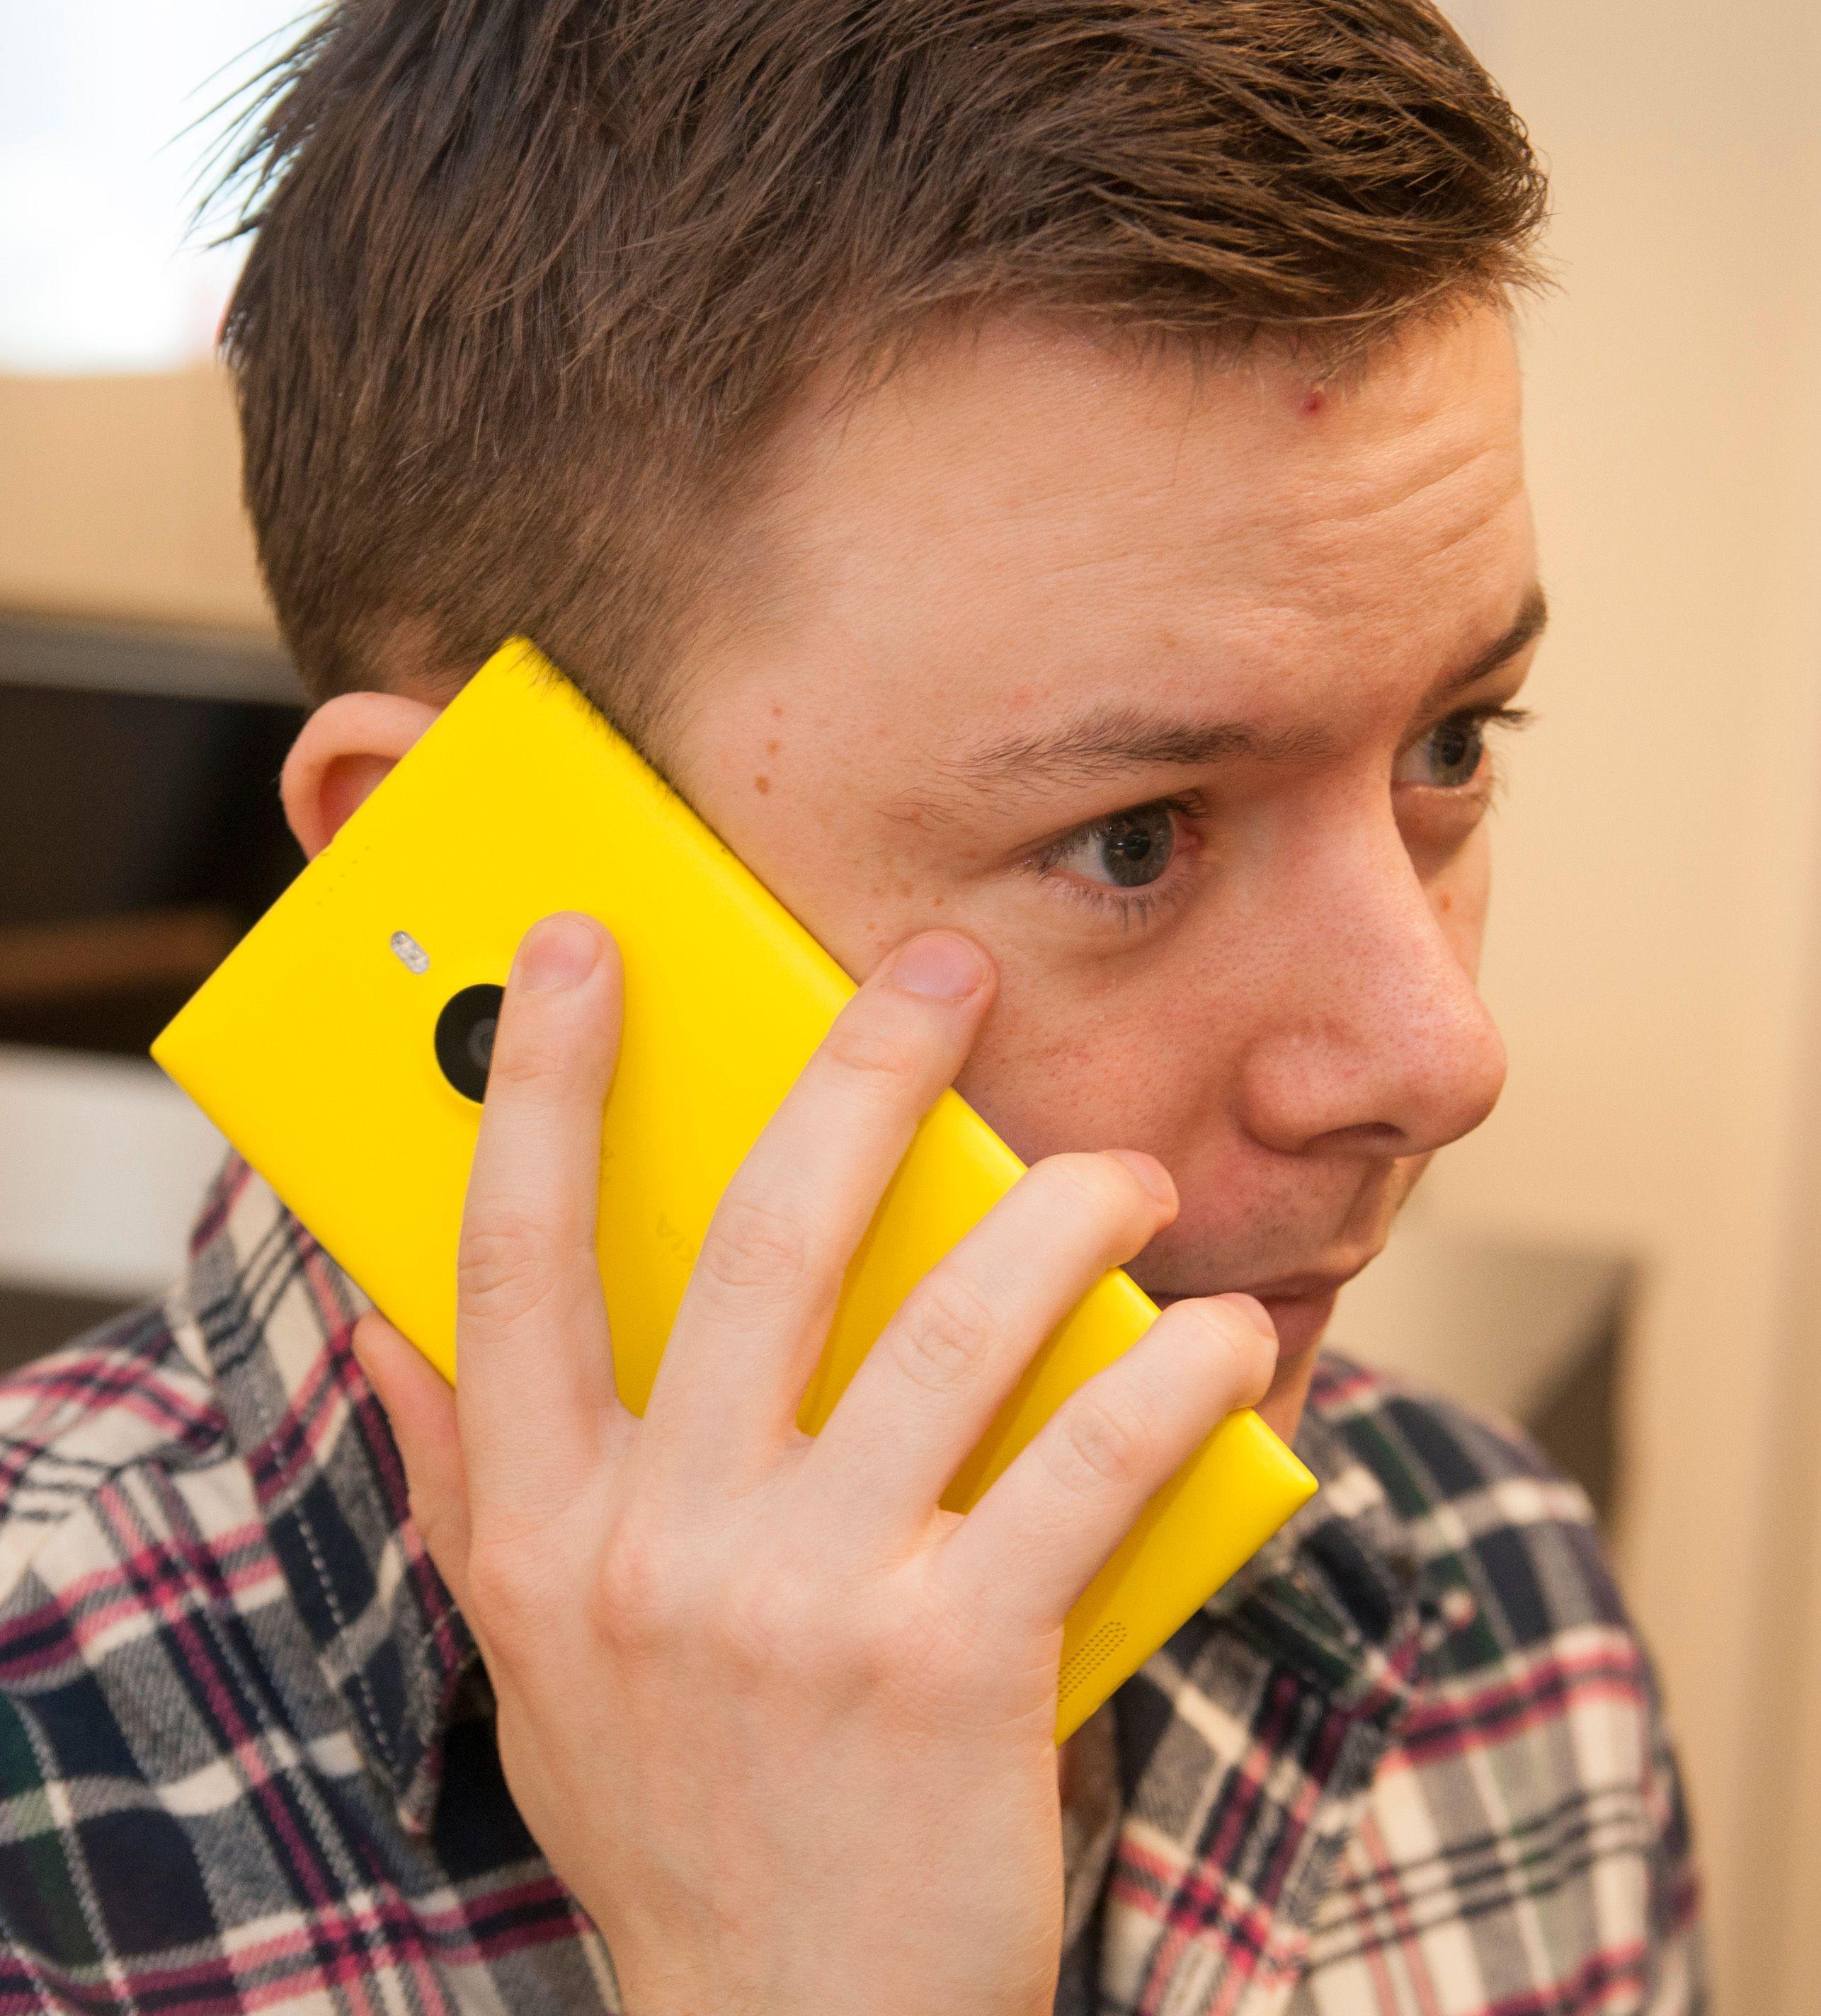 Lumia 1520 er en voksen telefon, og er nok i største laget for mange hender.Foto: Finn Jarle Kvalheim, Amobil.no